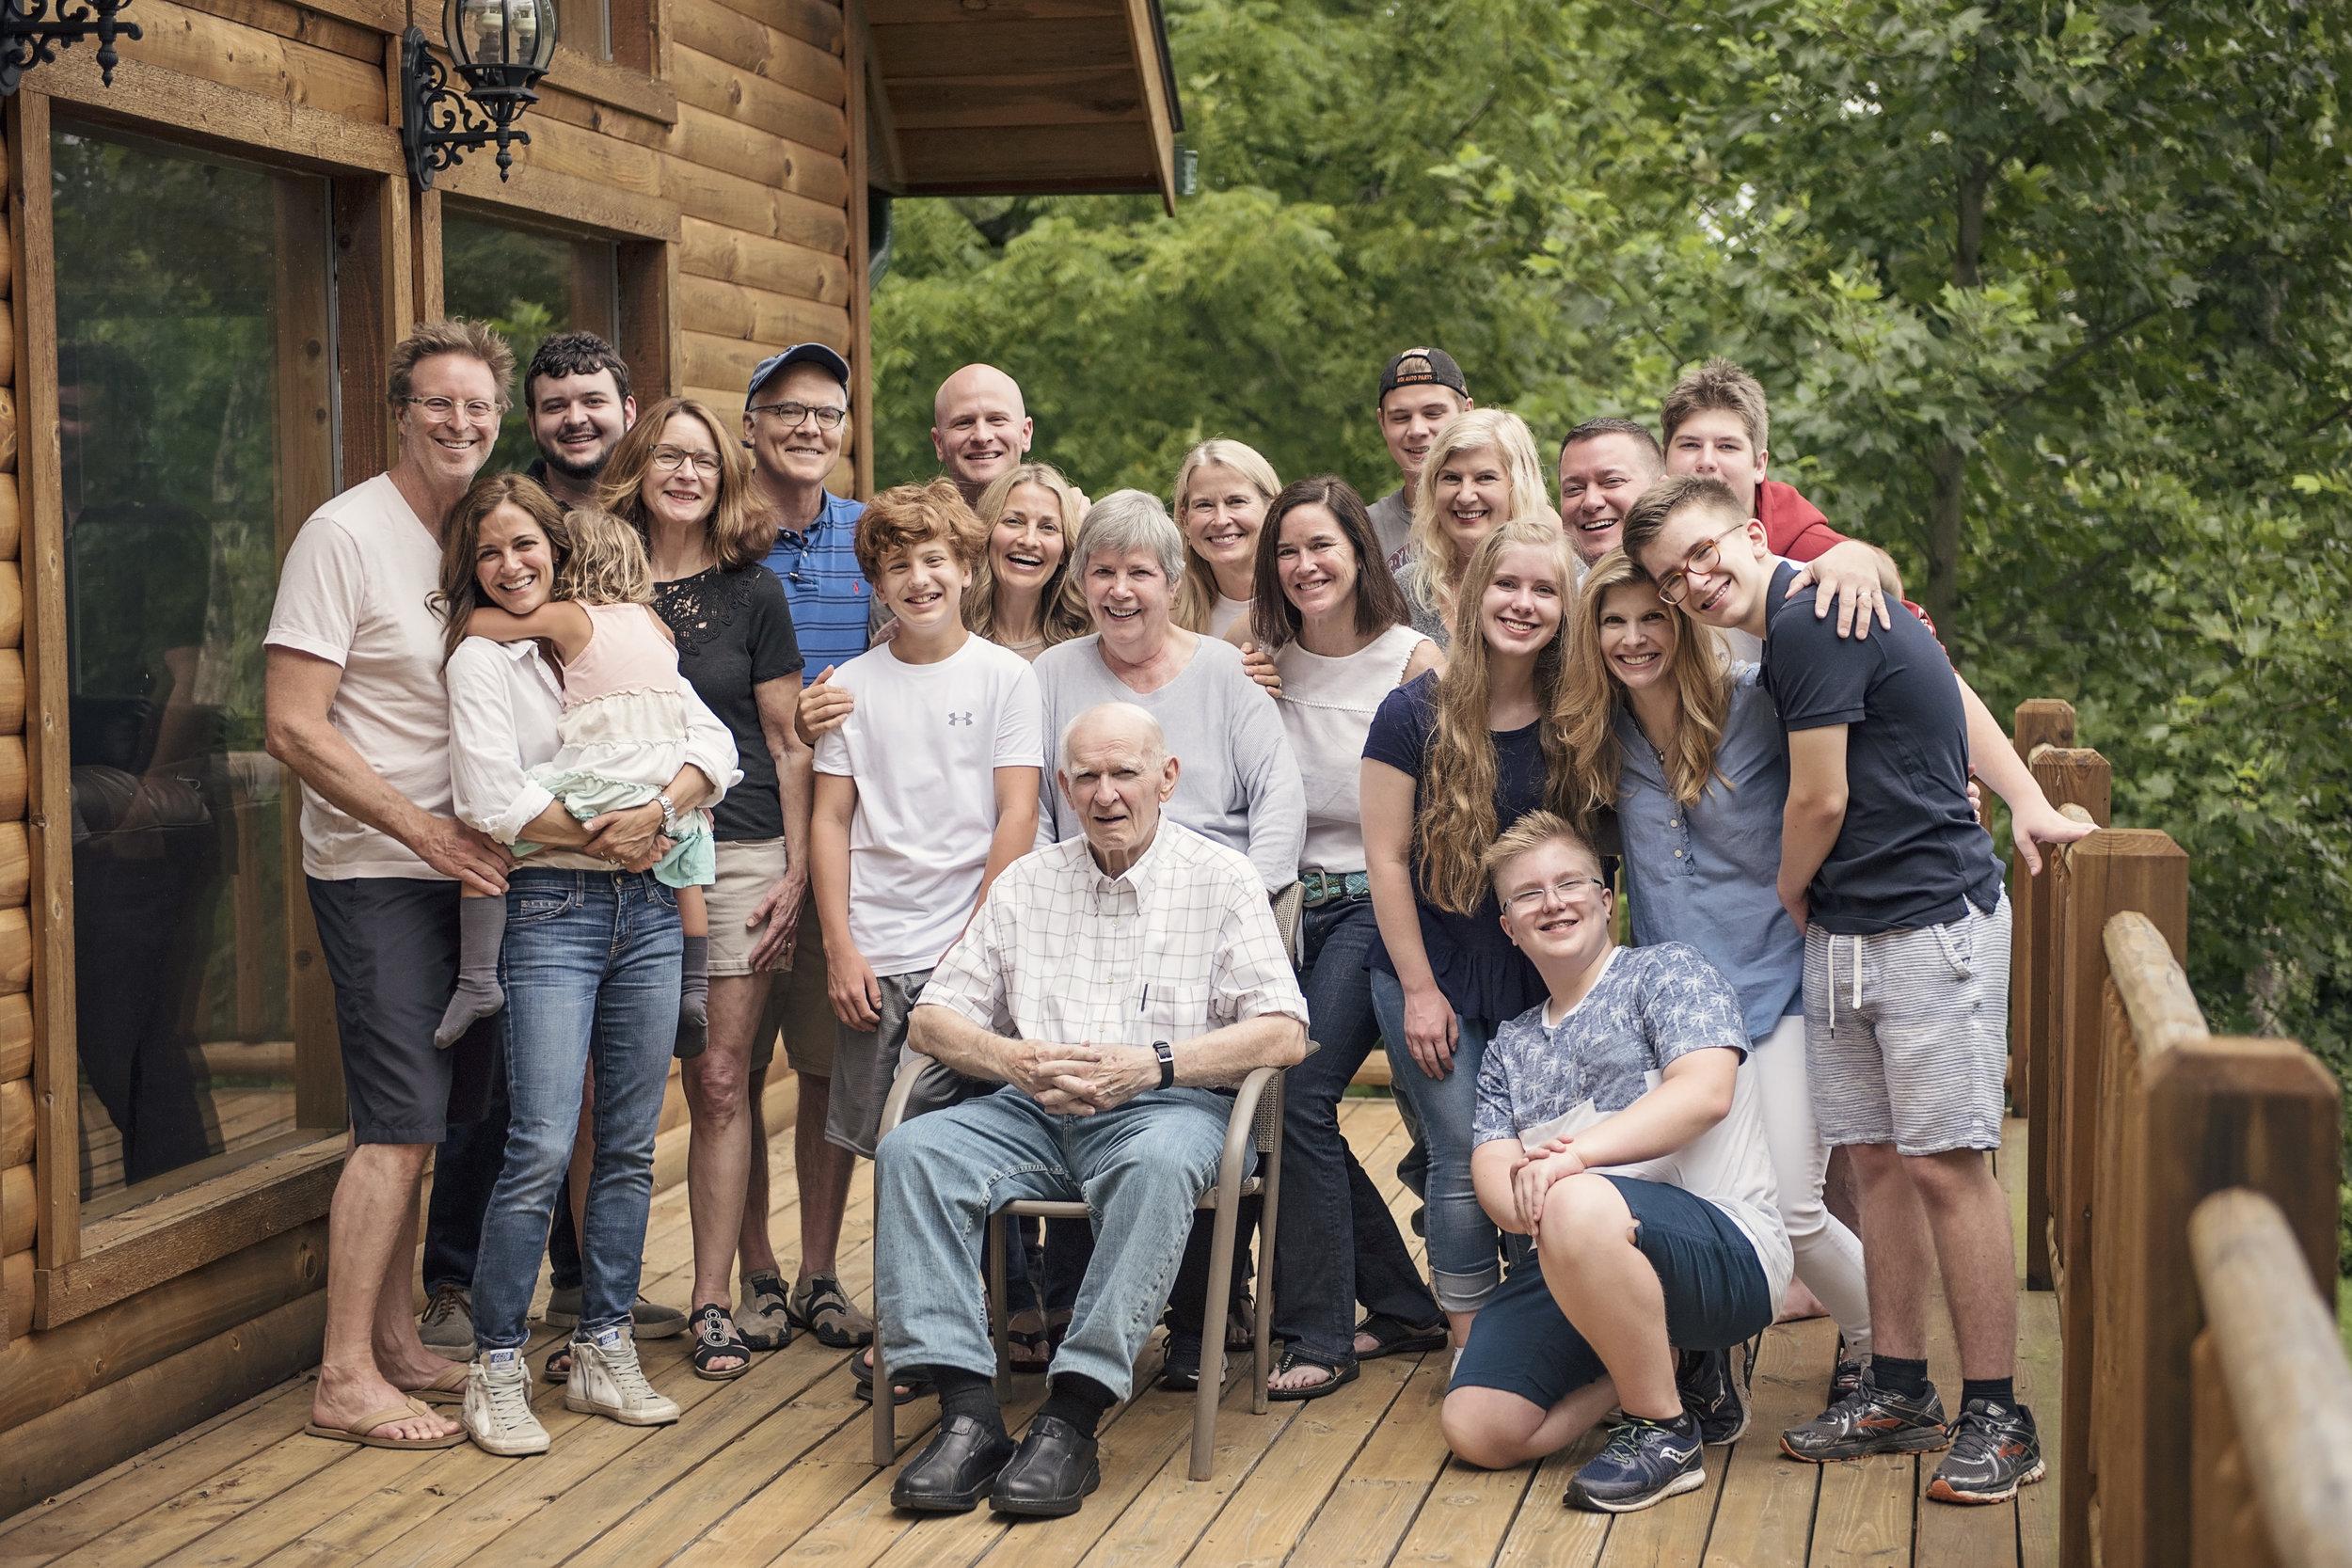 Multi-generational_Family_Summer18_10.jpg